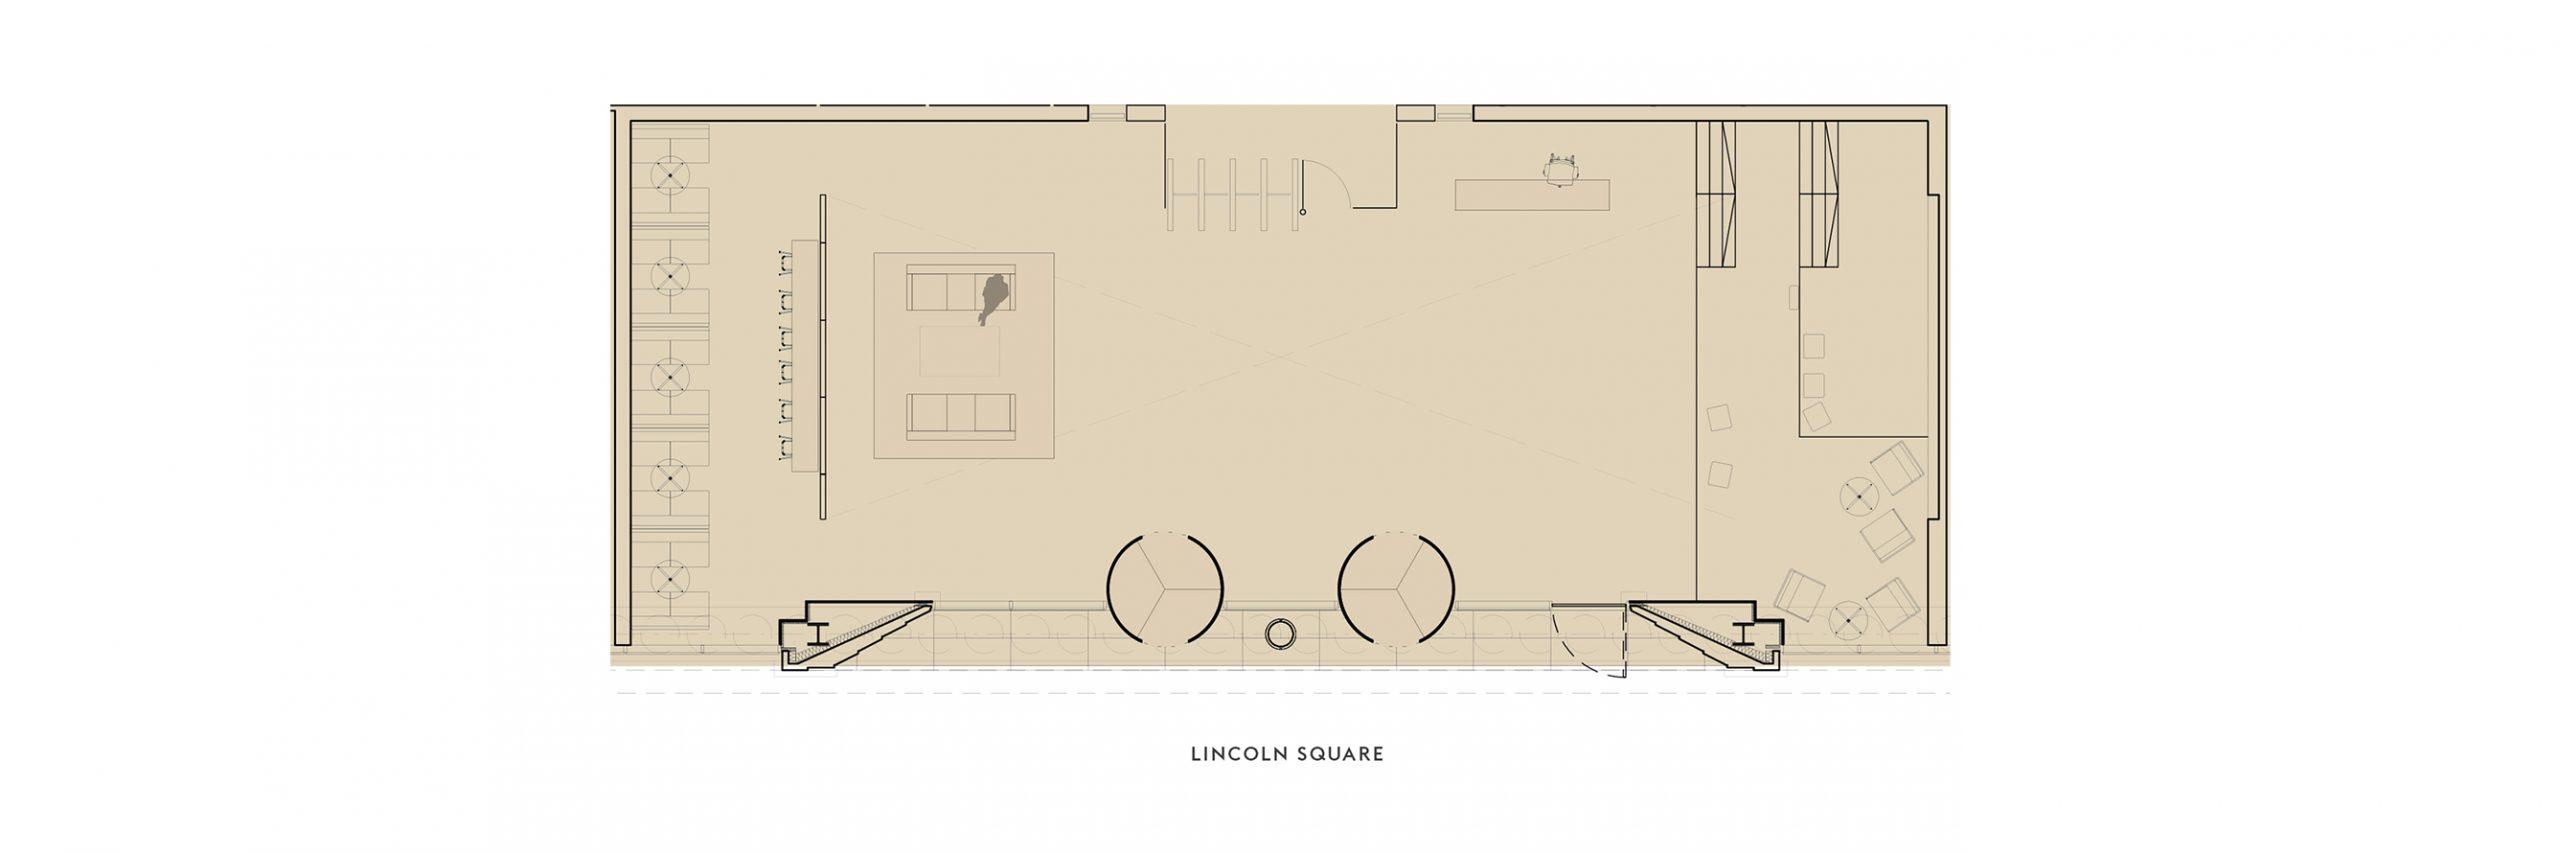 Reception floor plan